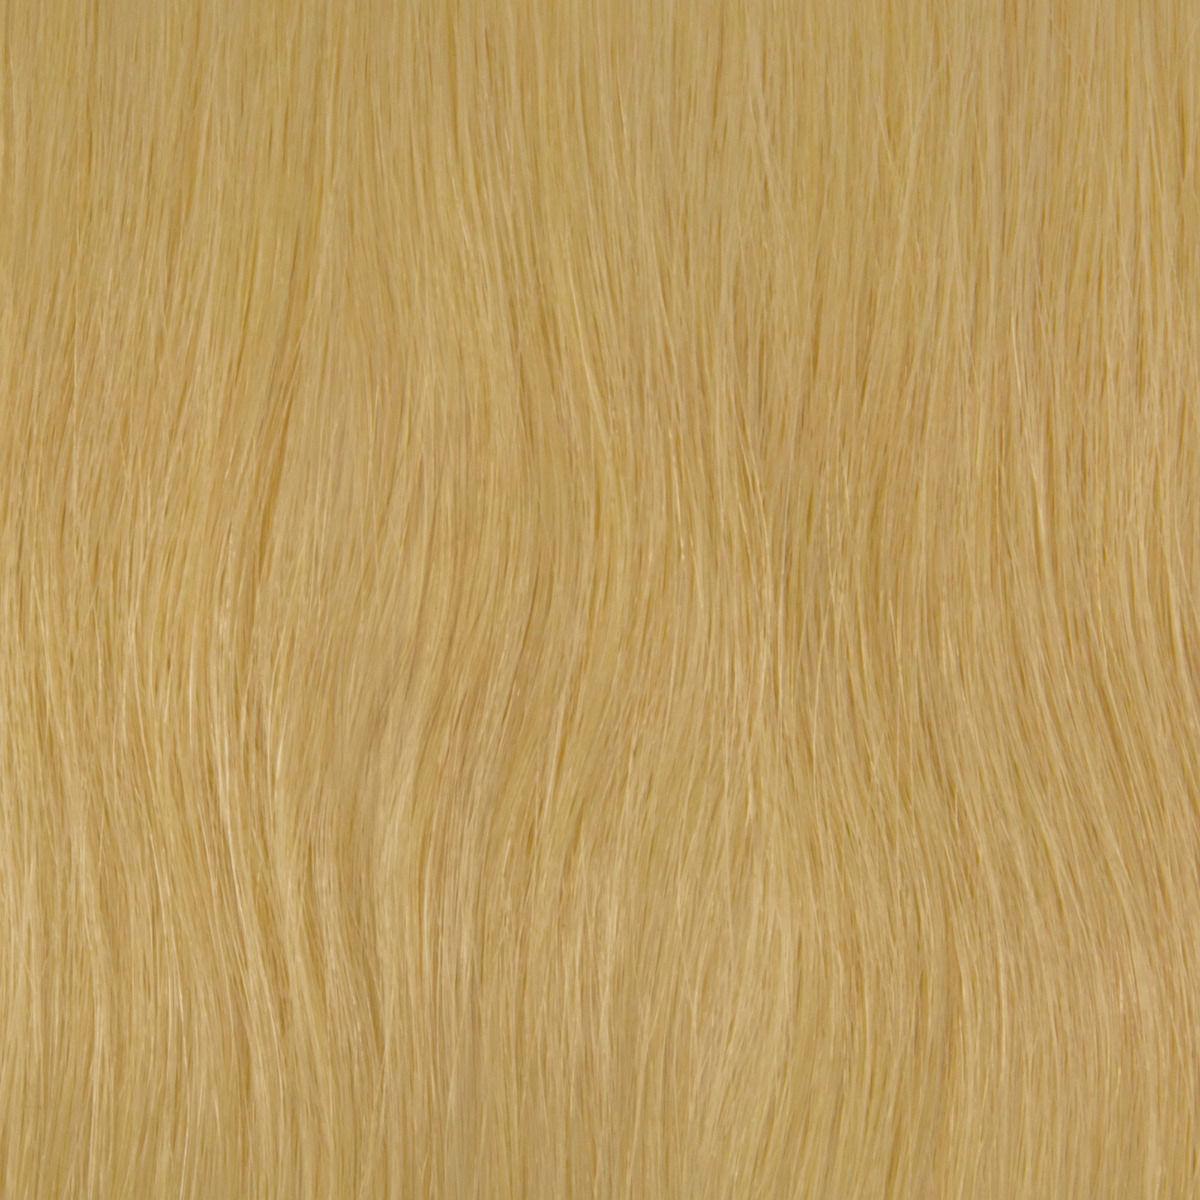 Afbeelding van Balmain Microring Extensions - natural straight - 40cm - #L10